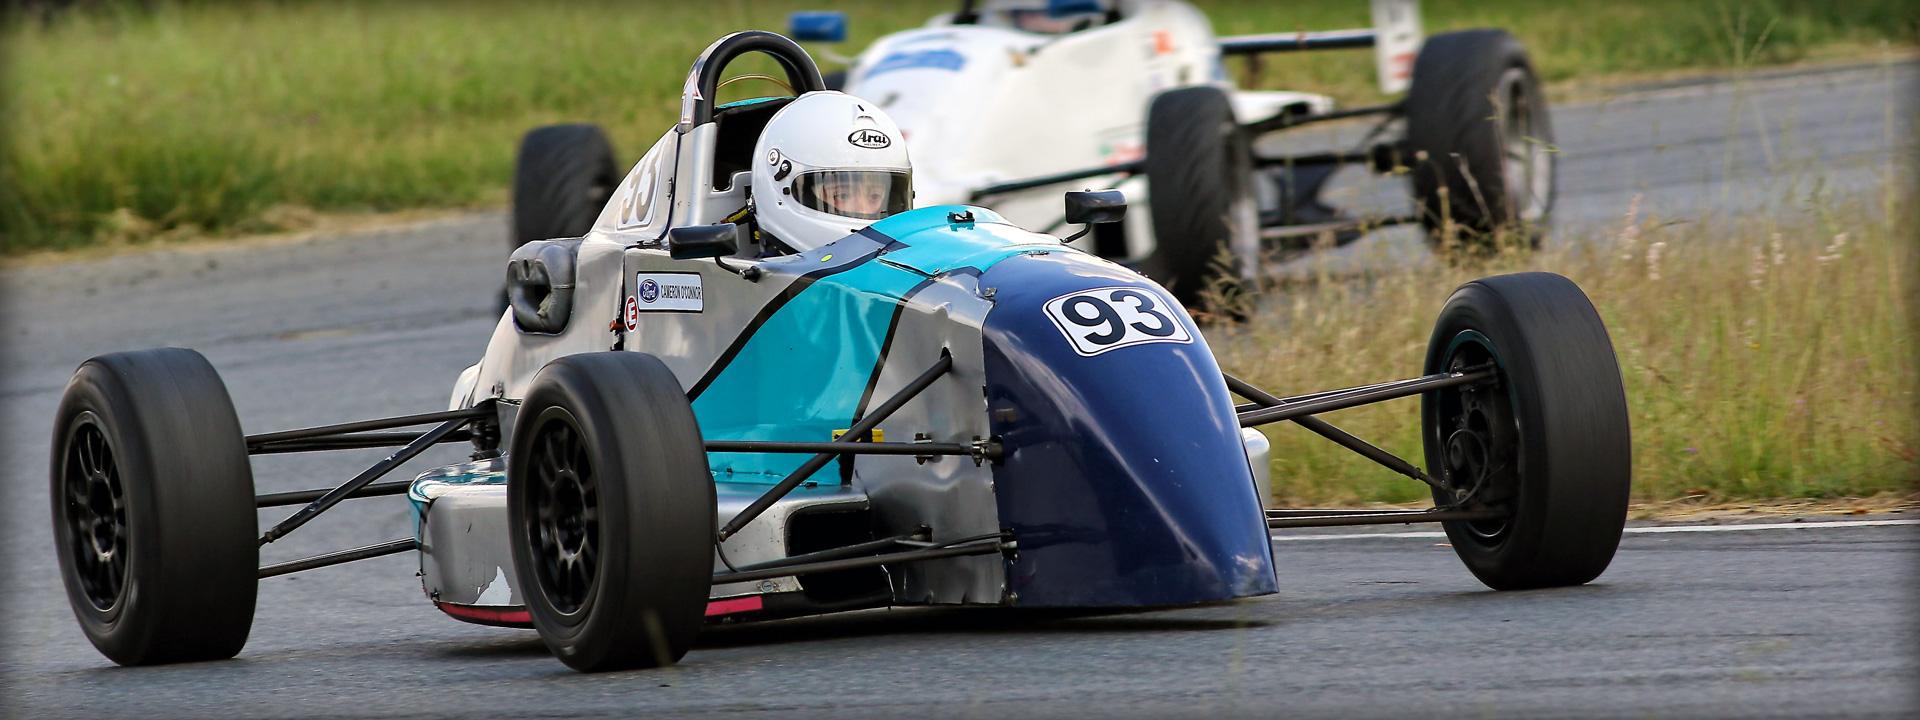 Inland Championship - Round 1 - Midvaal Raceway - 2017-02-11 - Photographs